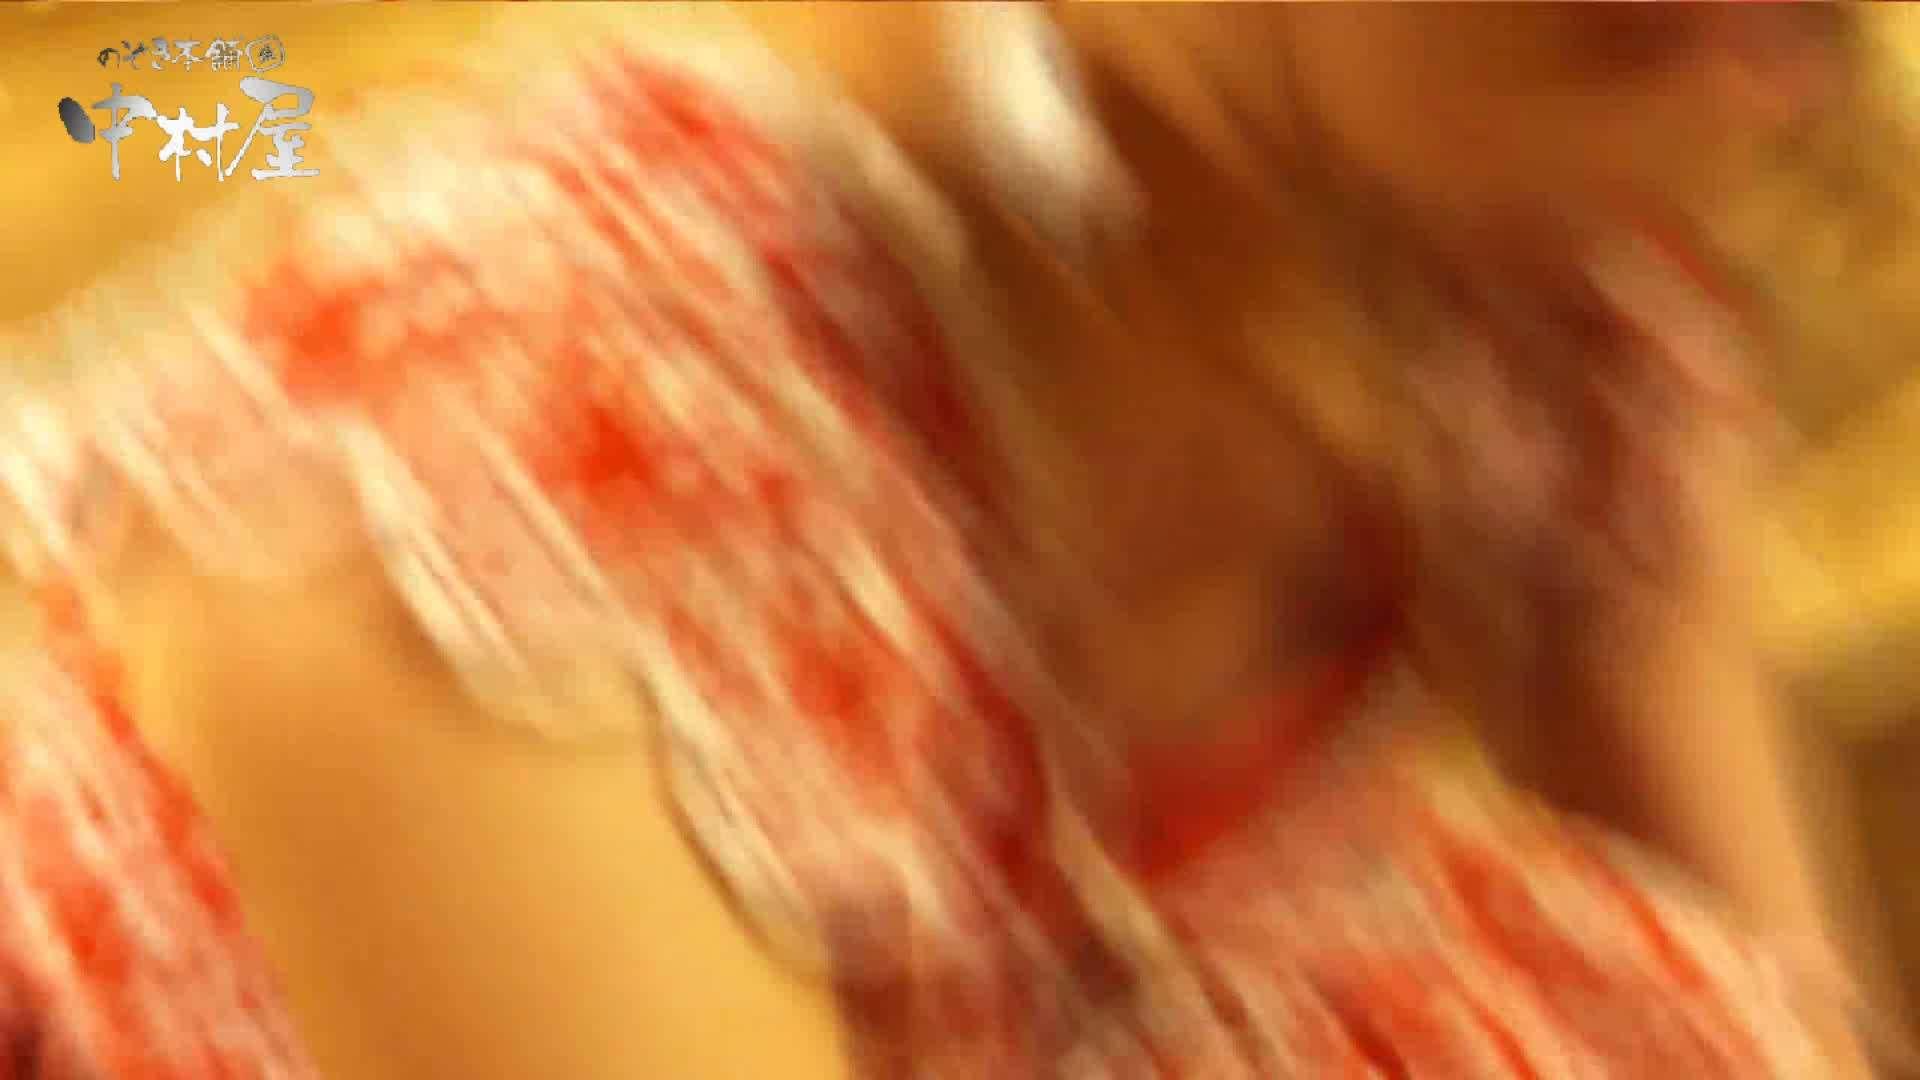 vol.43 可愛いカリスマ店員限定‼胸チラ&パンチラ 美脚おねーさんの胸元ゲット! 胸チラ  11pic 10